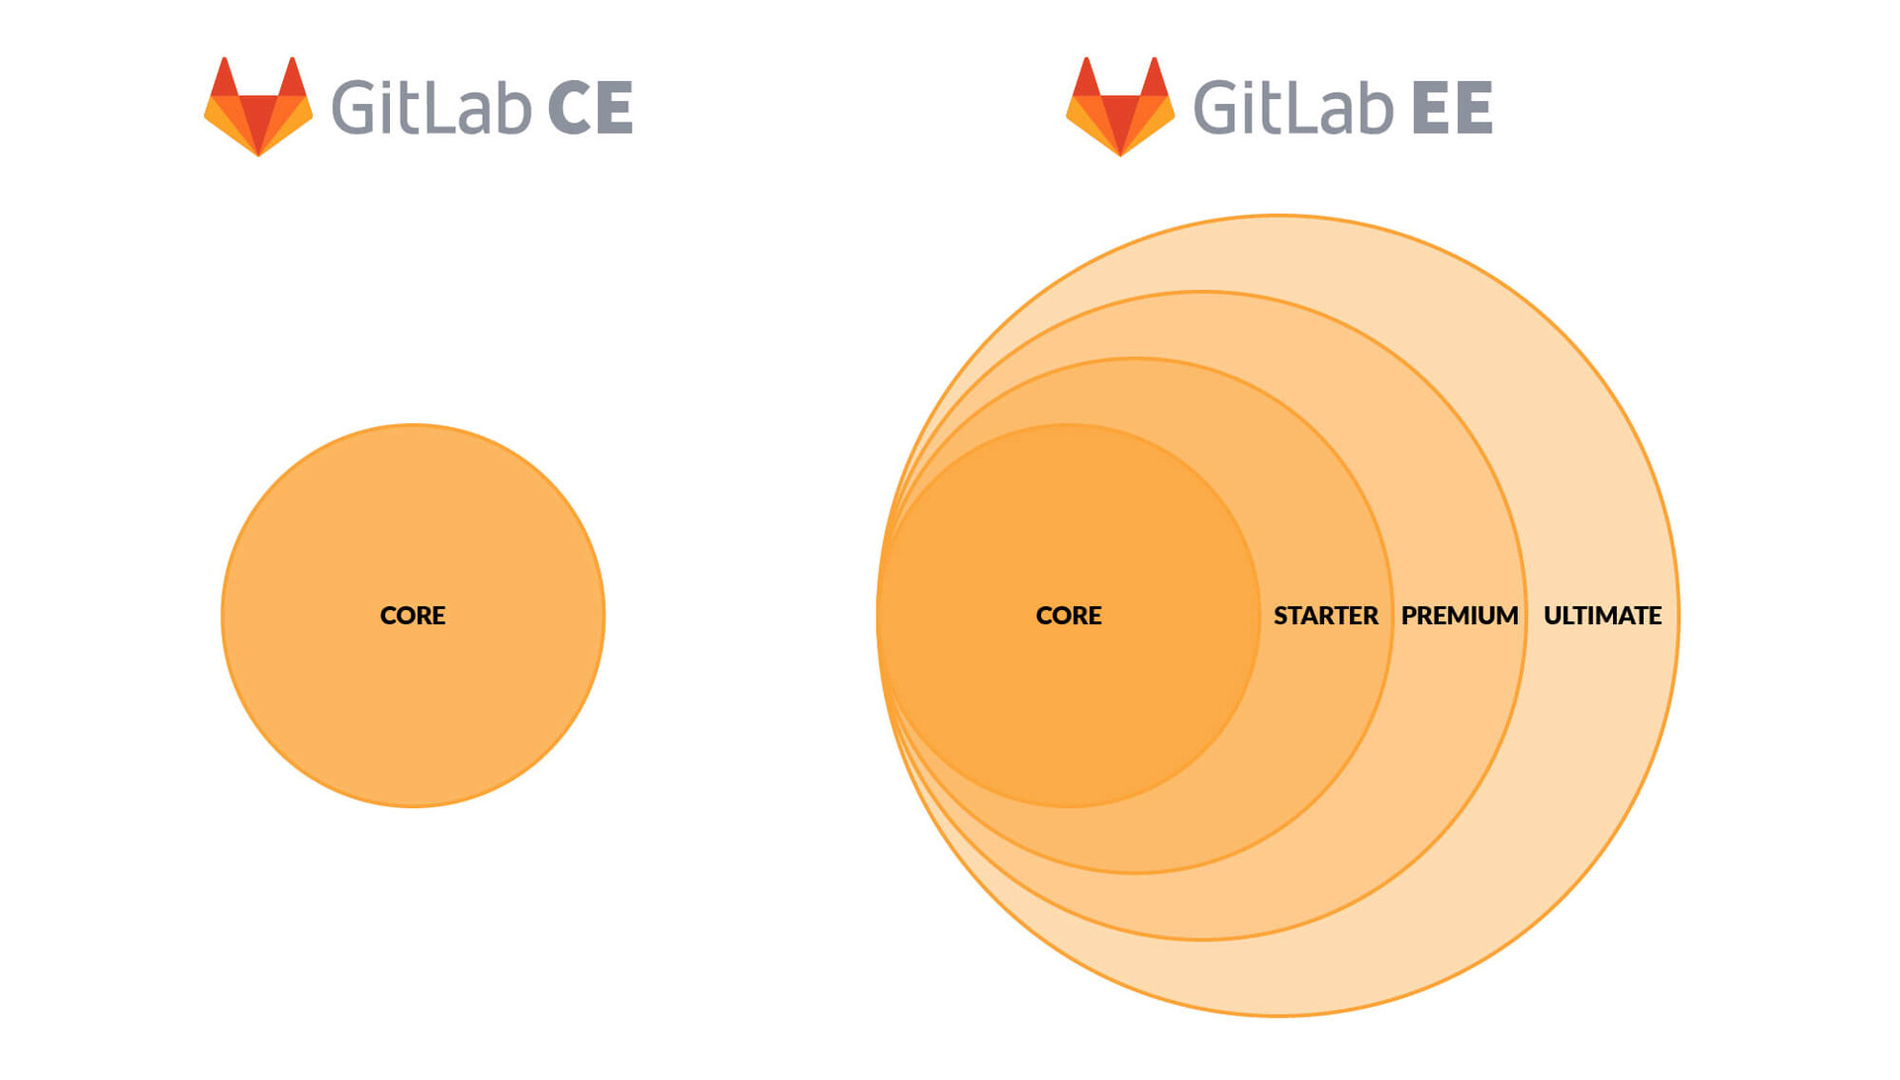 GitLab Core, Starter, Premium, Ultimate